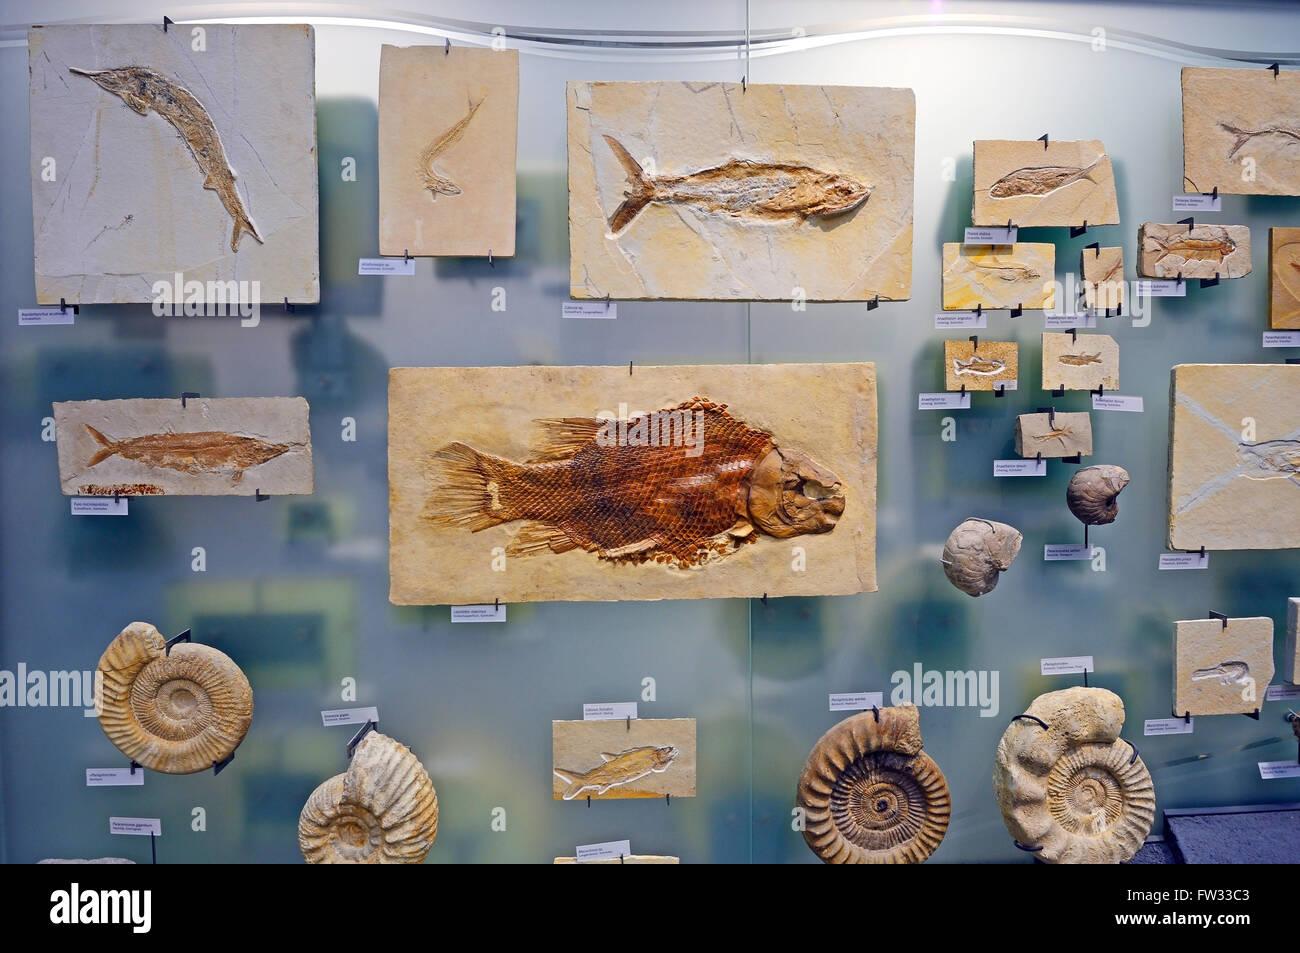 Various underwater animal fossils, Naturkundemuseum, Natural history museum, Berlin, Germany - Stock Image